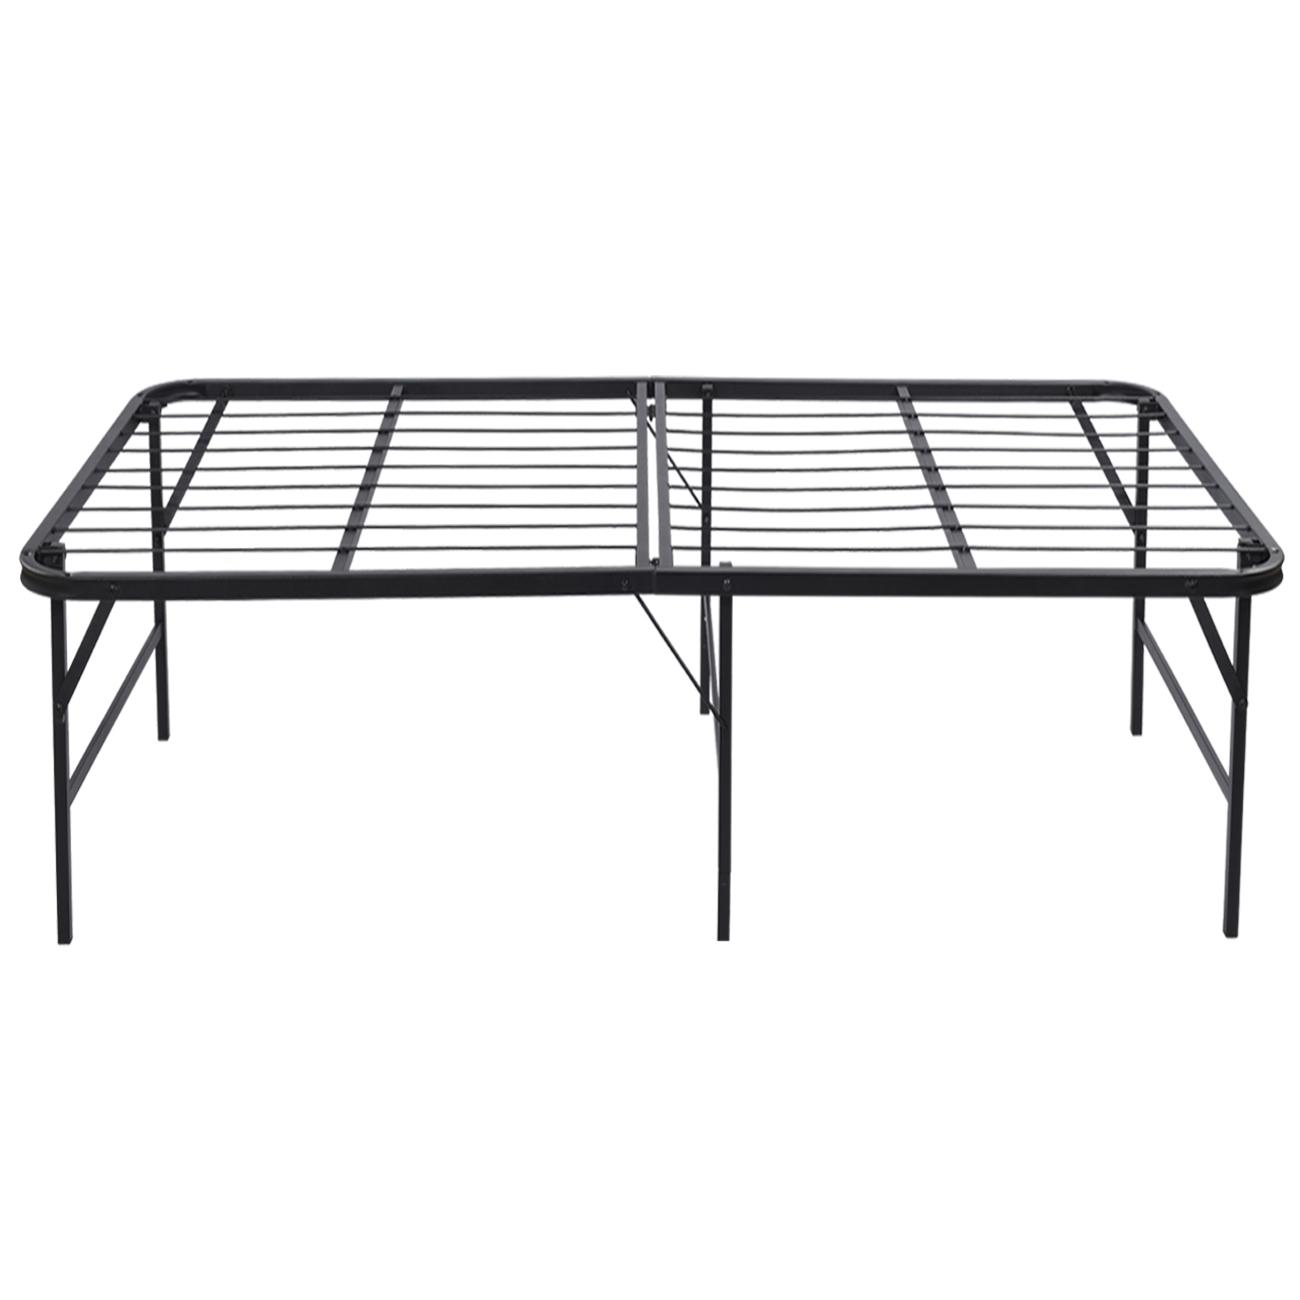 Platform bed frame steel heavy duty size foldable bedroom storage 17 twin xl ebay - Platform bed frame australia ...